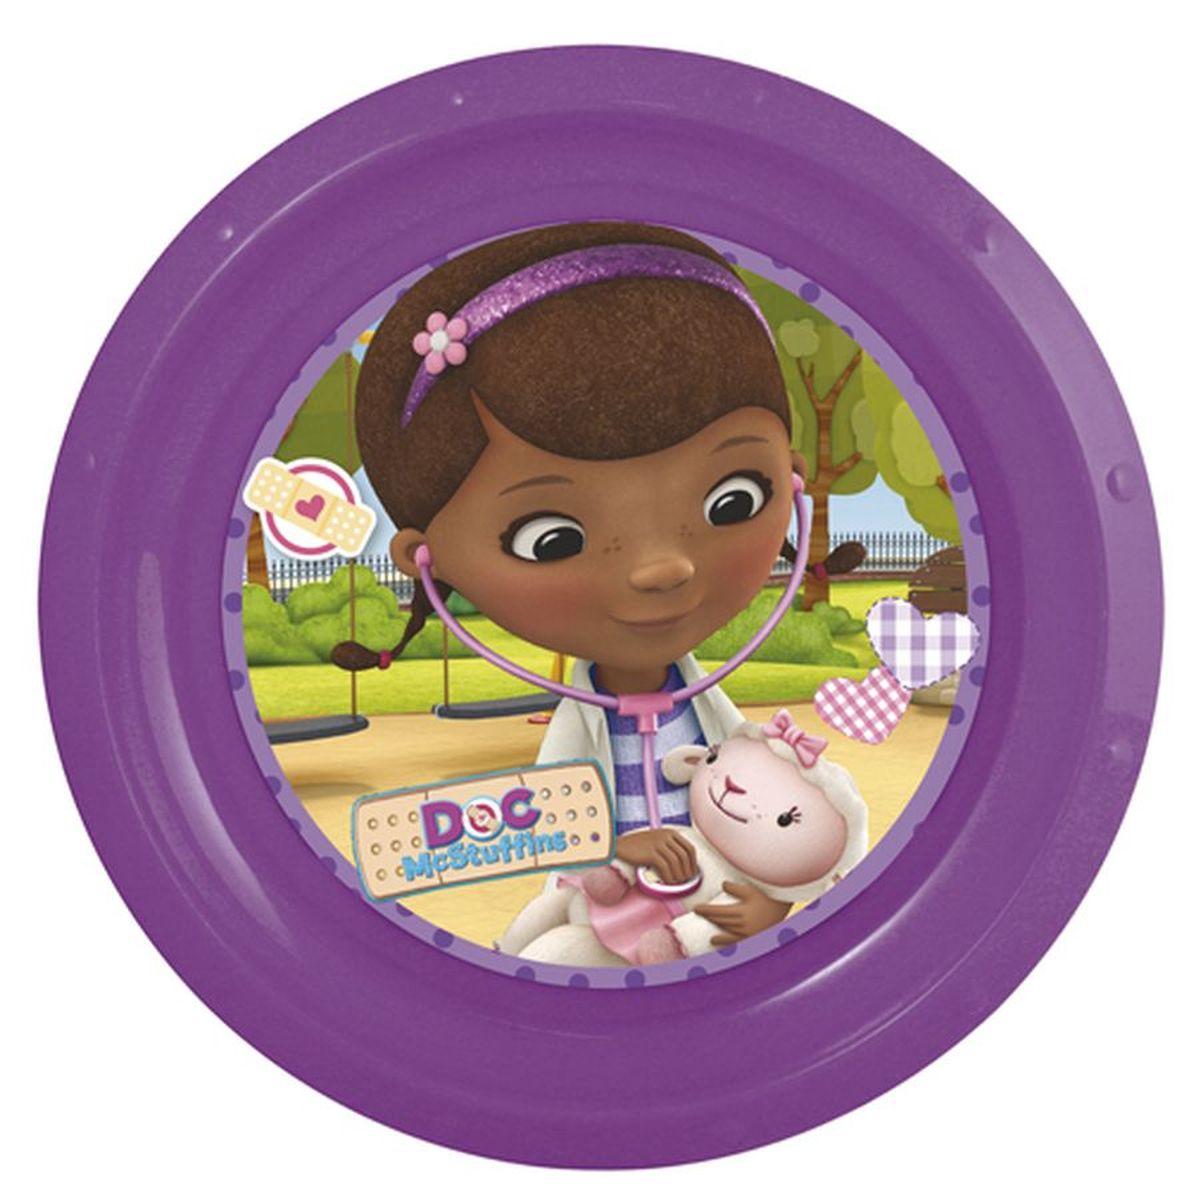 Disney Тарелка Доктор Плюшева диаметр 21,5 см